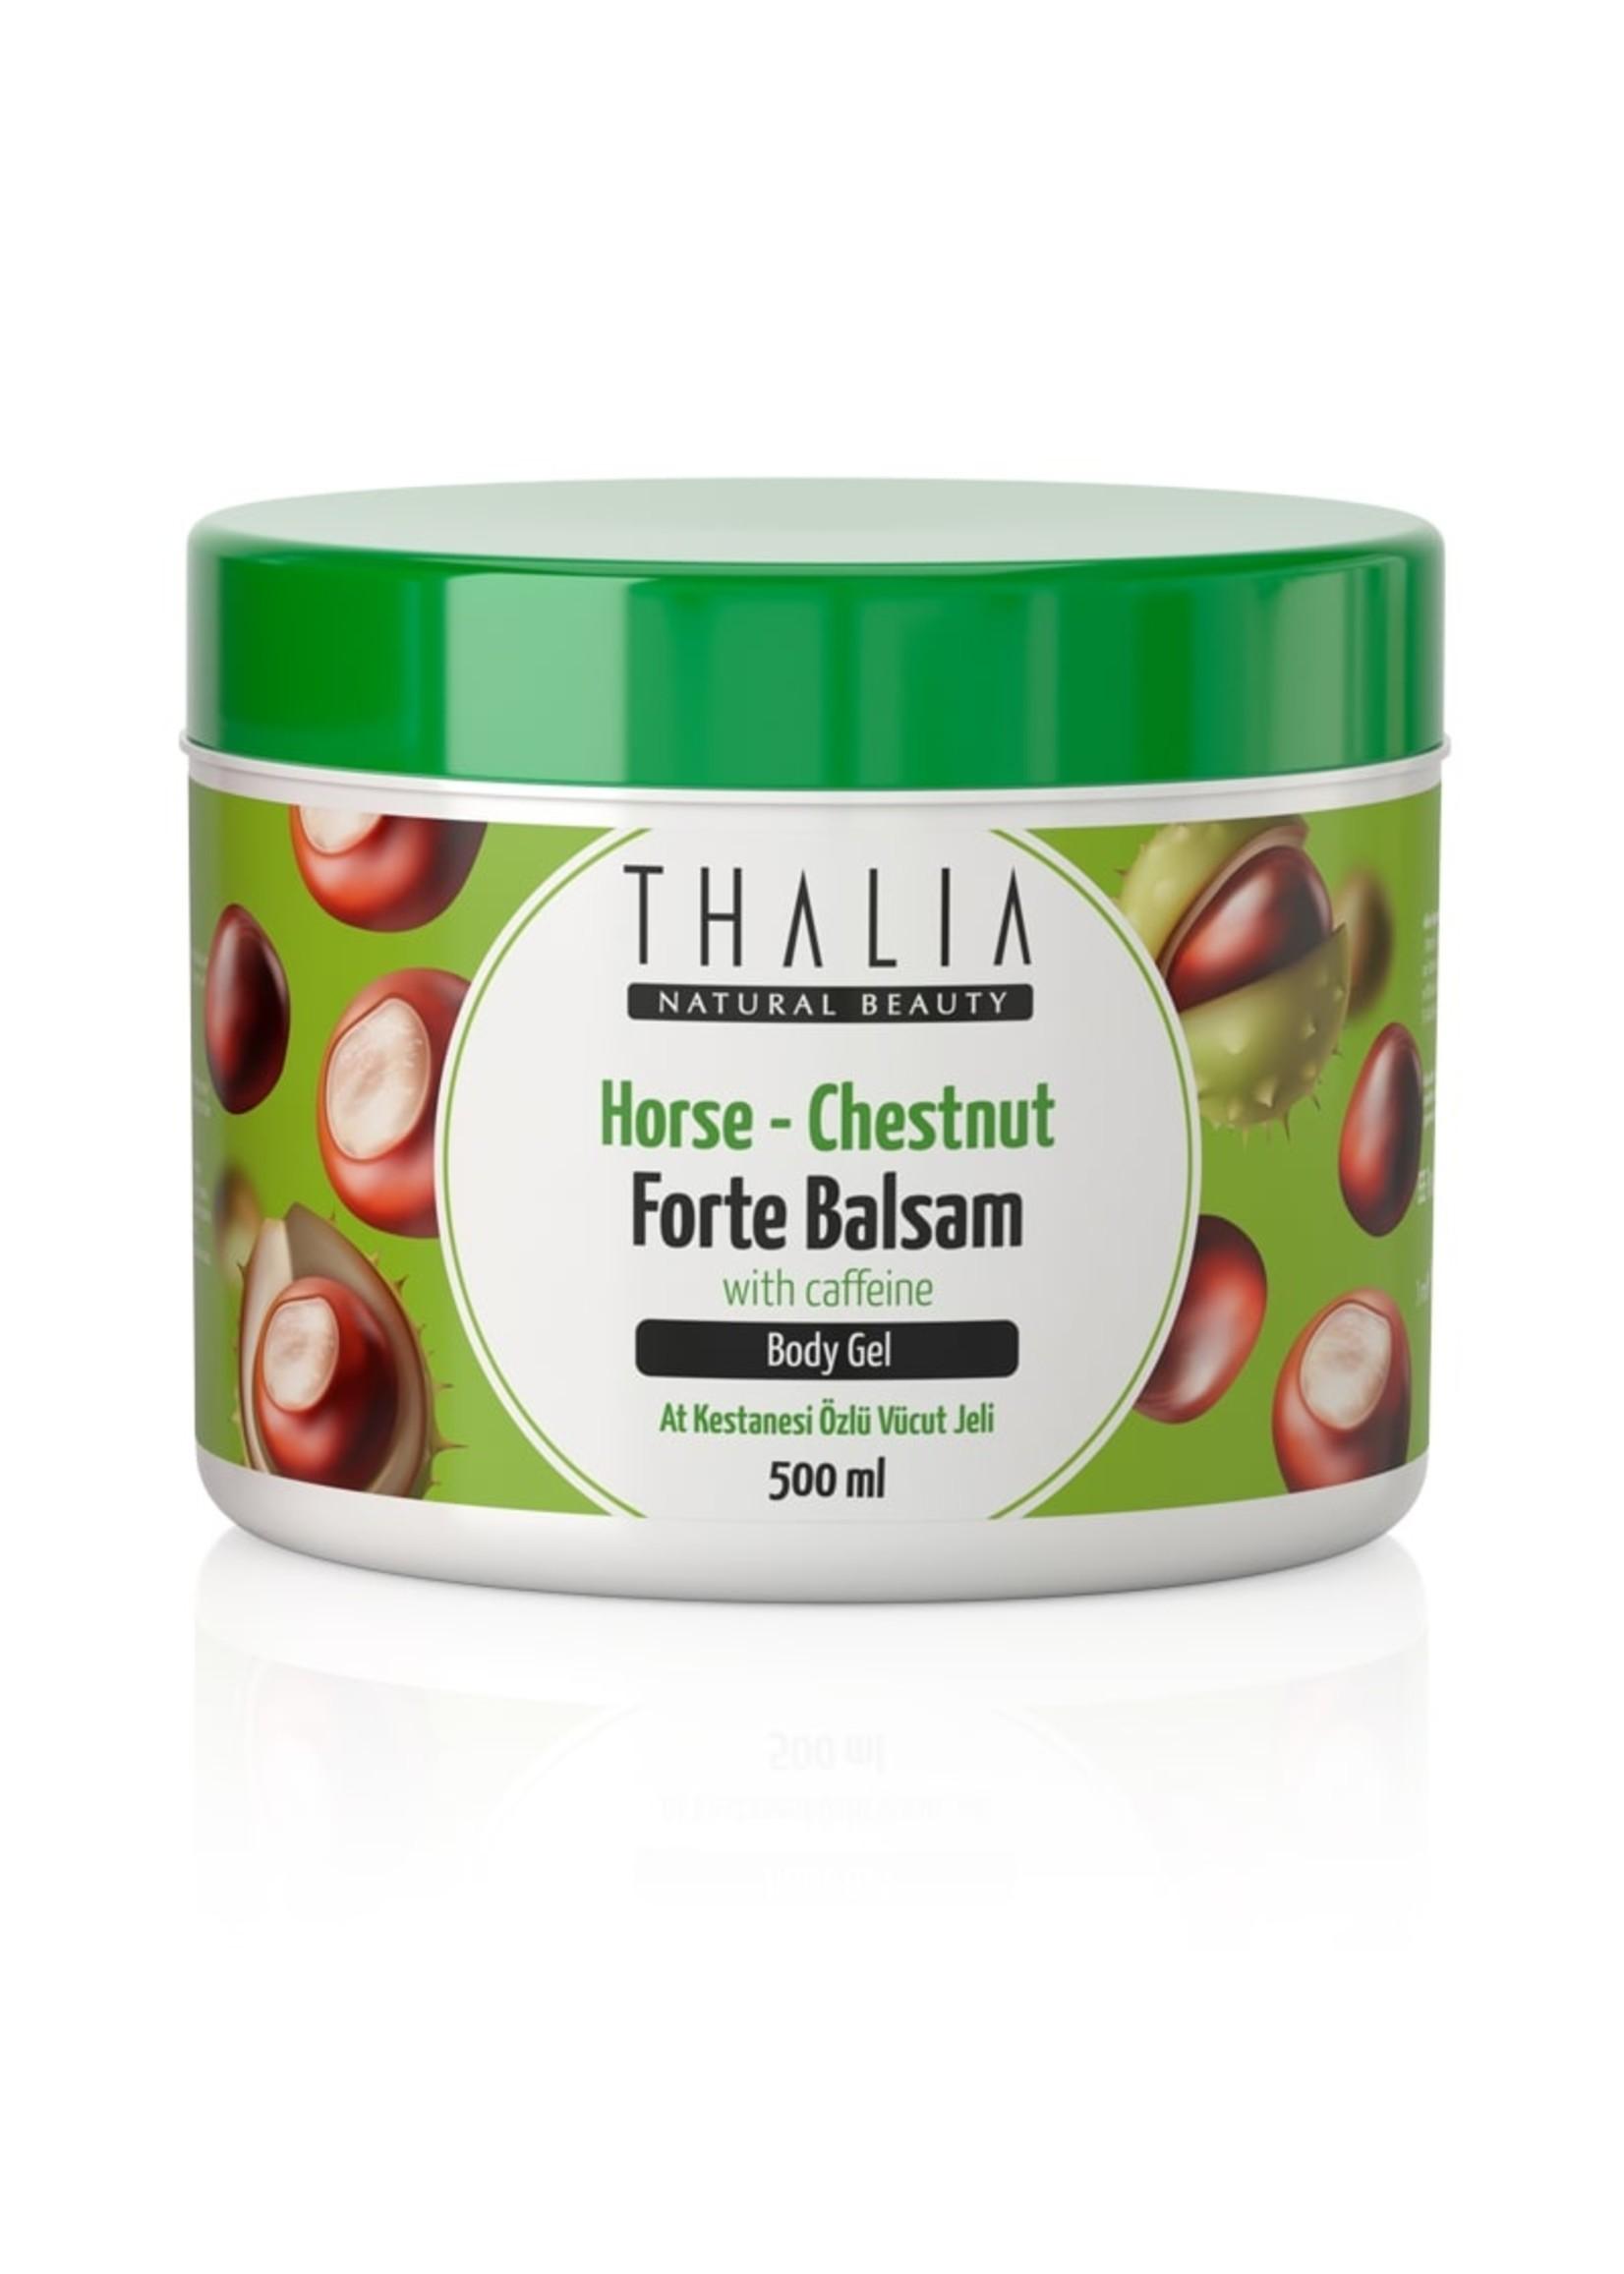 Thalia Paardenkastanje & Cafeïne Massagegel Forte Balsem - 500 ml